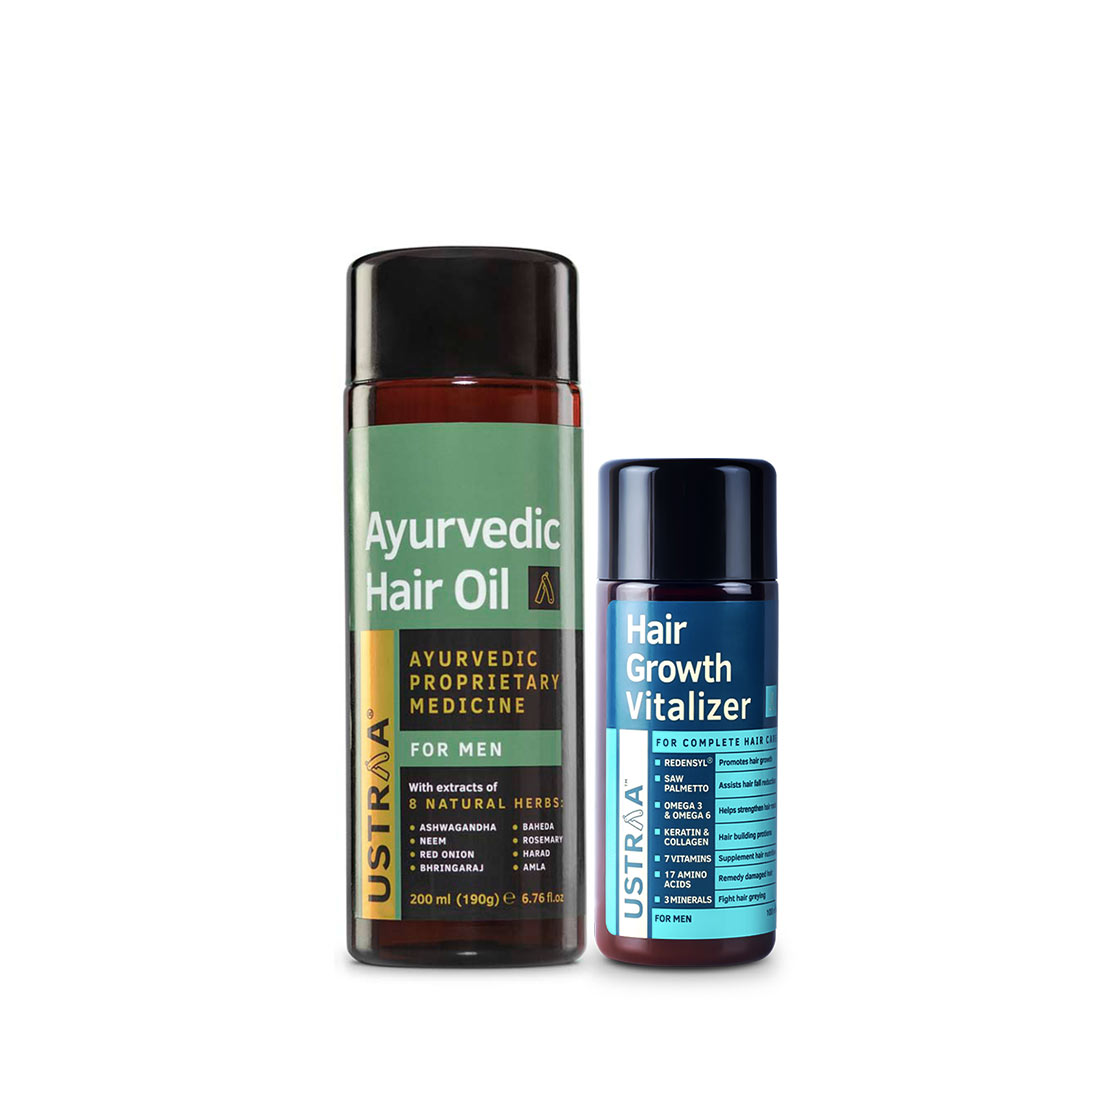 Ustraa | Ustraa Hair Growth Vitalizer - 100 ml & Ayurvedic Hair Oil - 200 ml